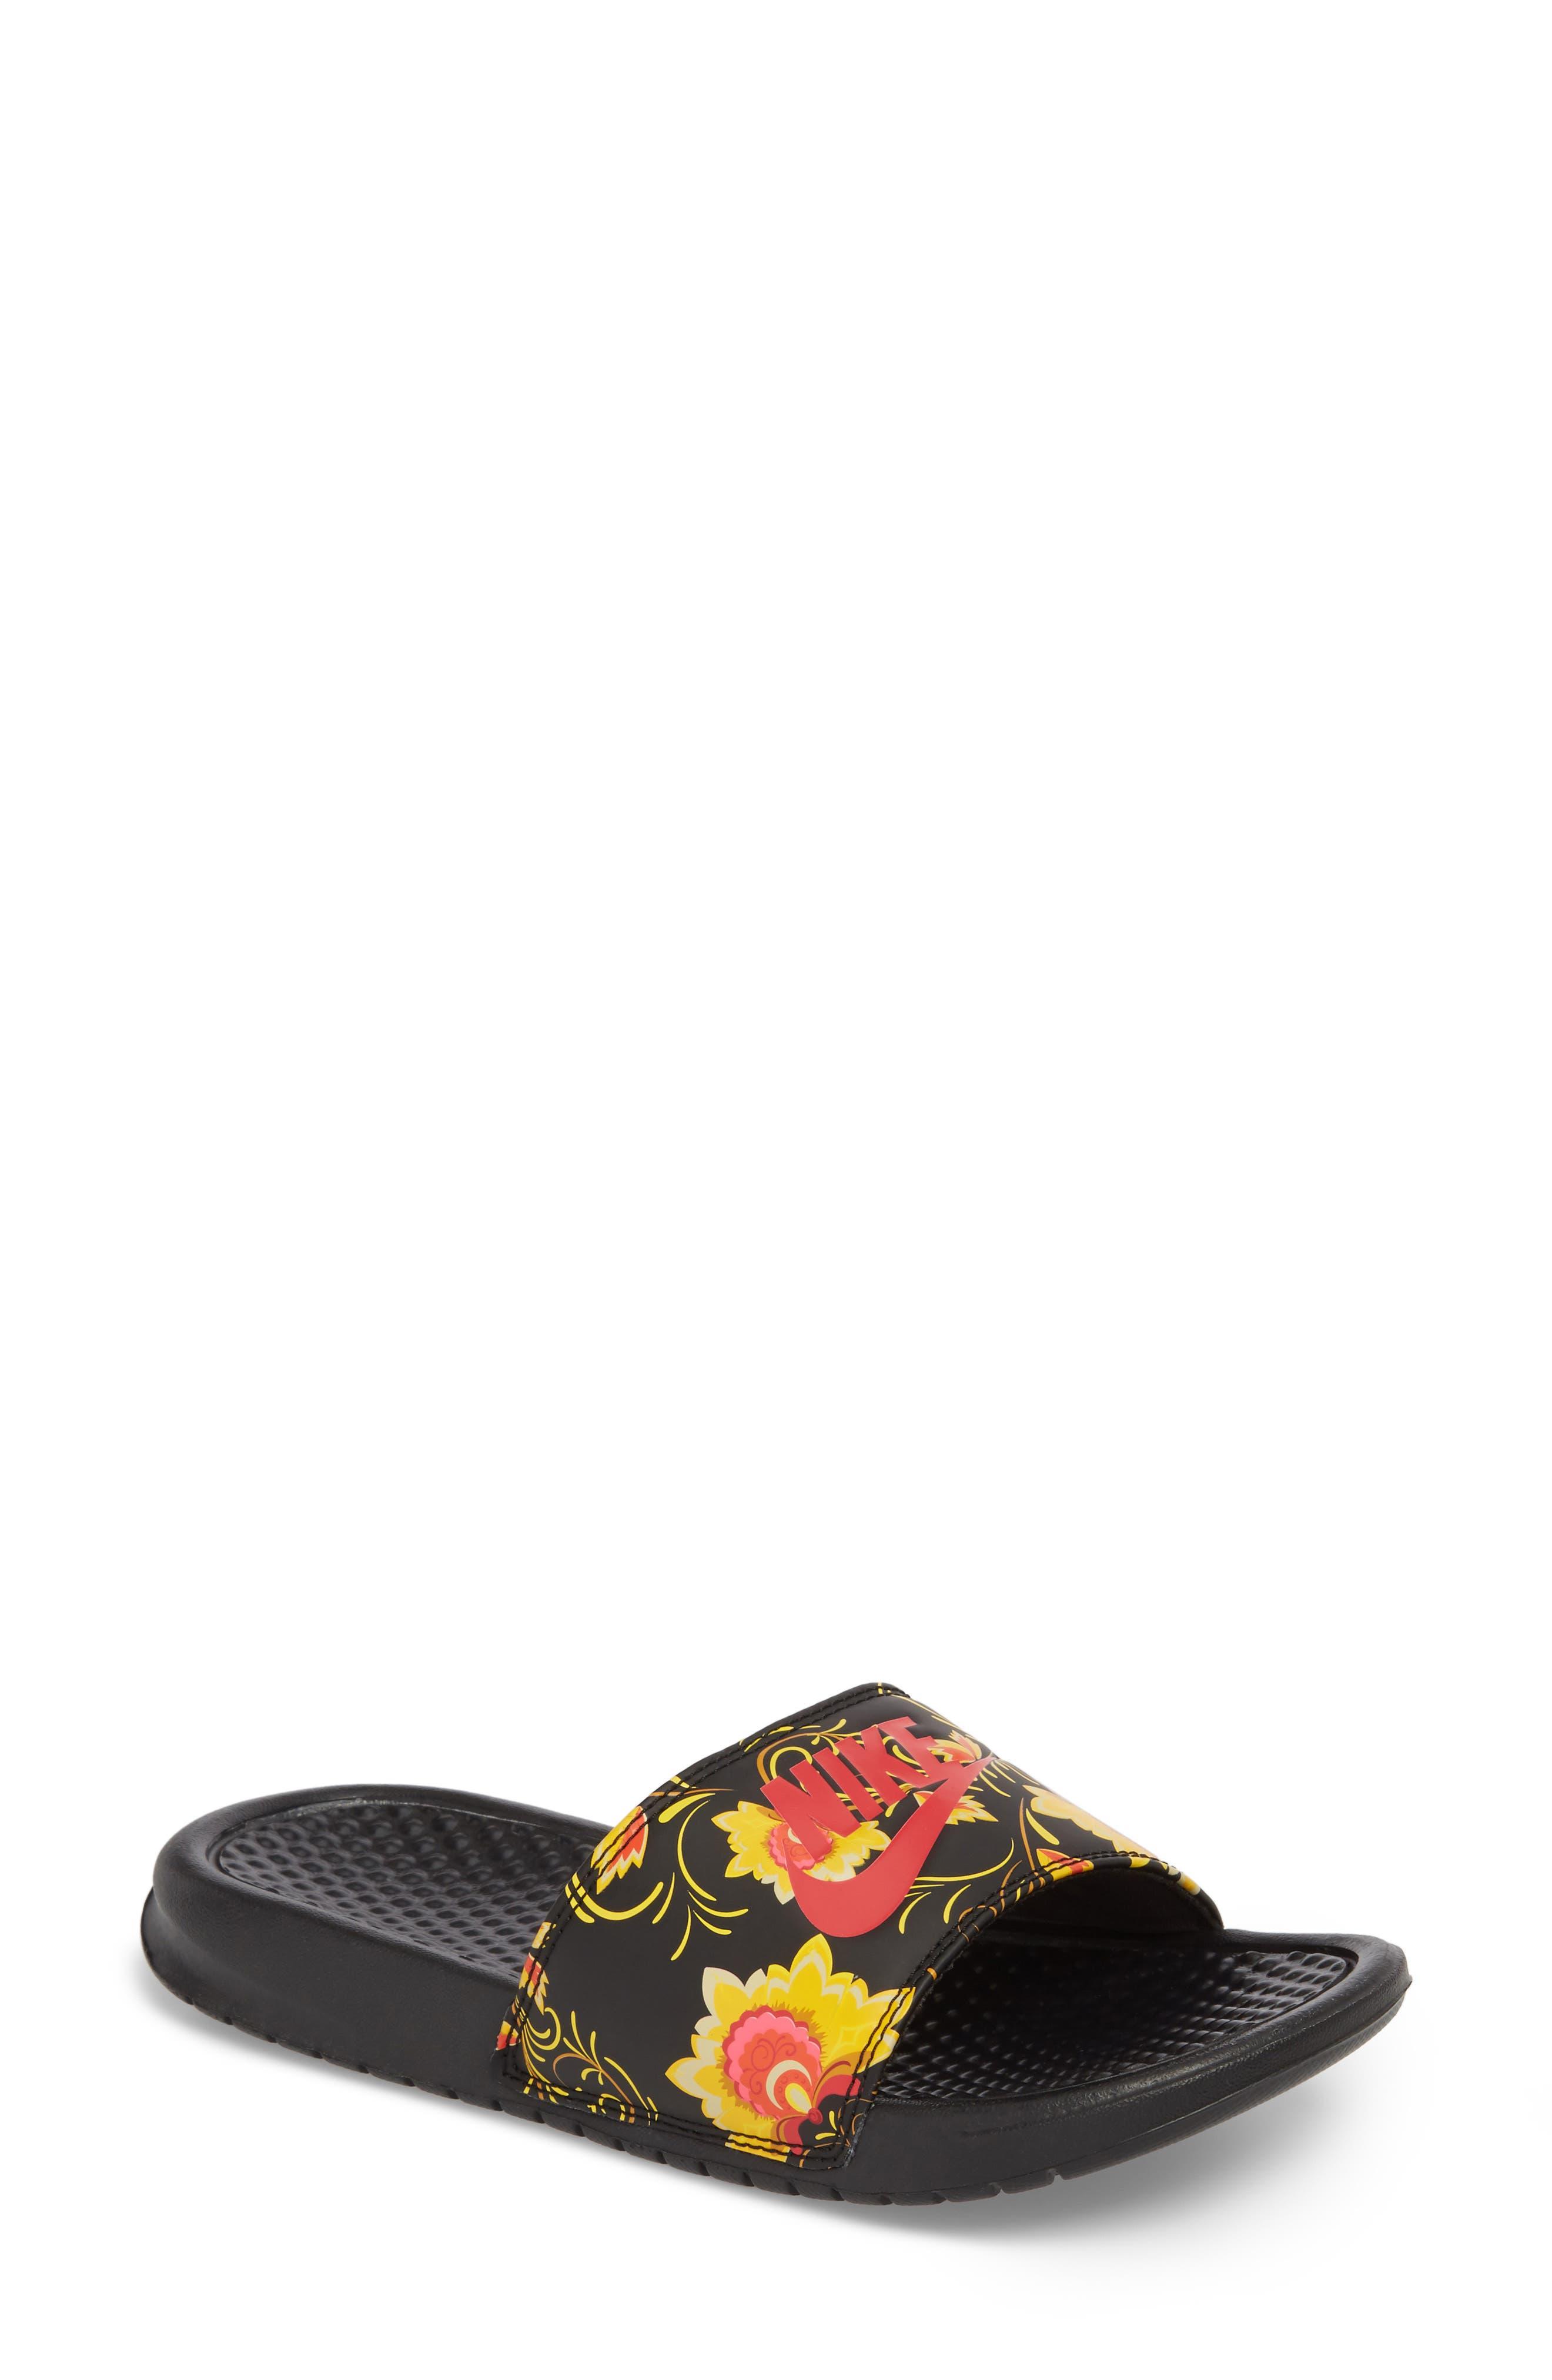 Benassi Floral Print Slide Sandal,                             Main thumbnail 1, color,                             600